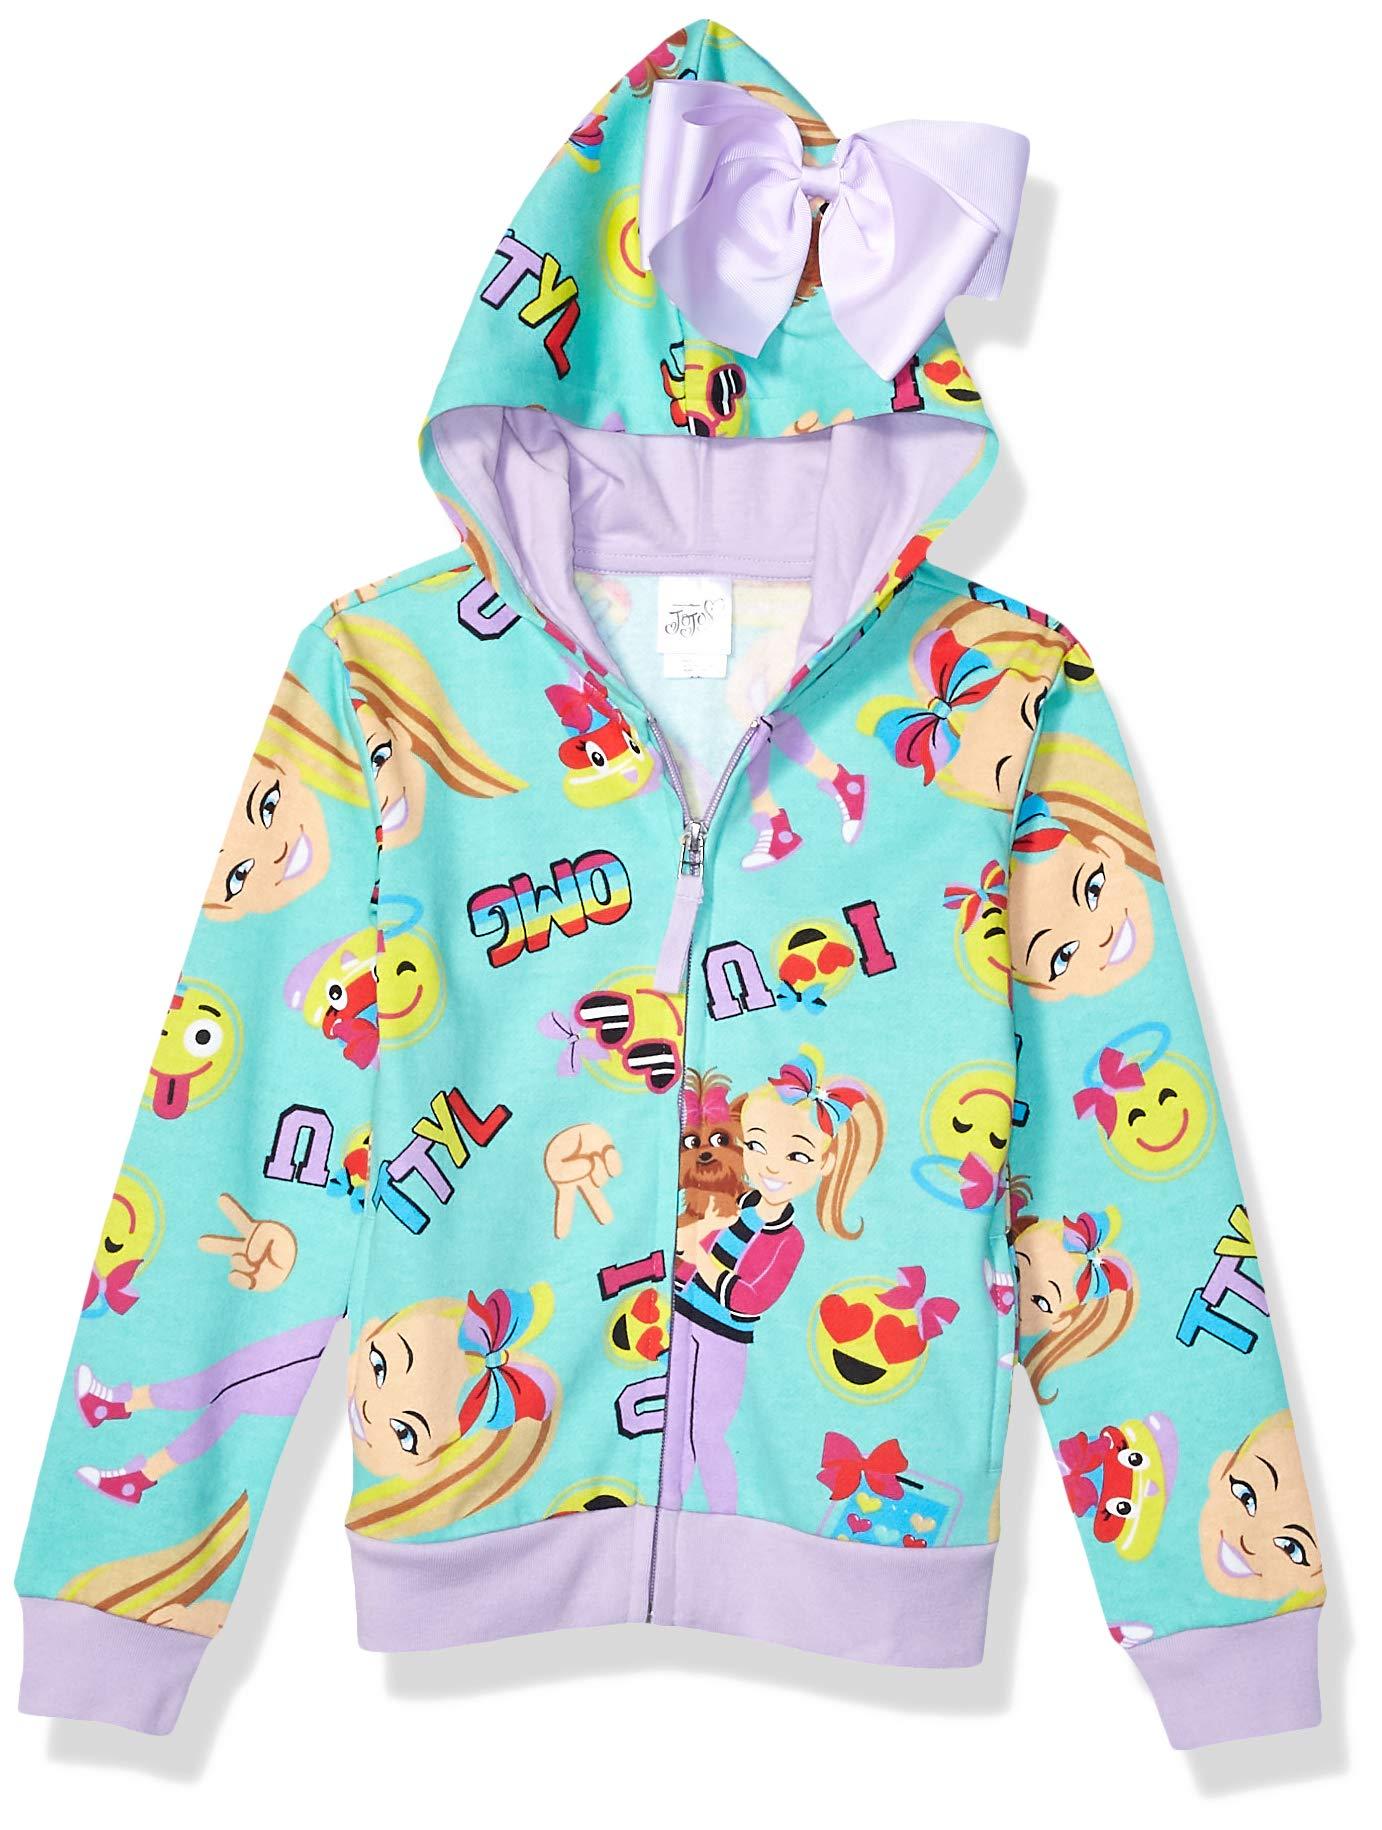 JoJo Siwa Women's Little Girls' Emoji Characters Zip Up Hoodie with Bow on Hood